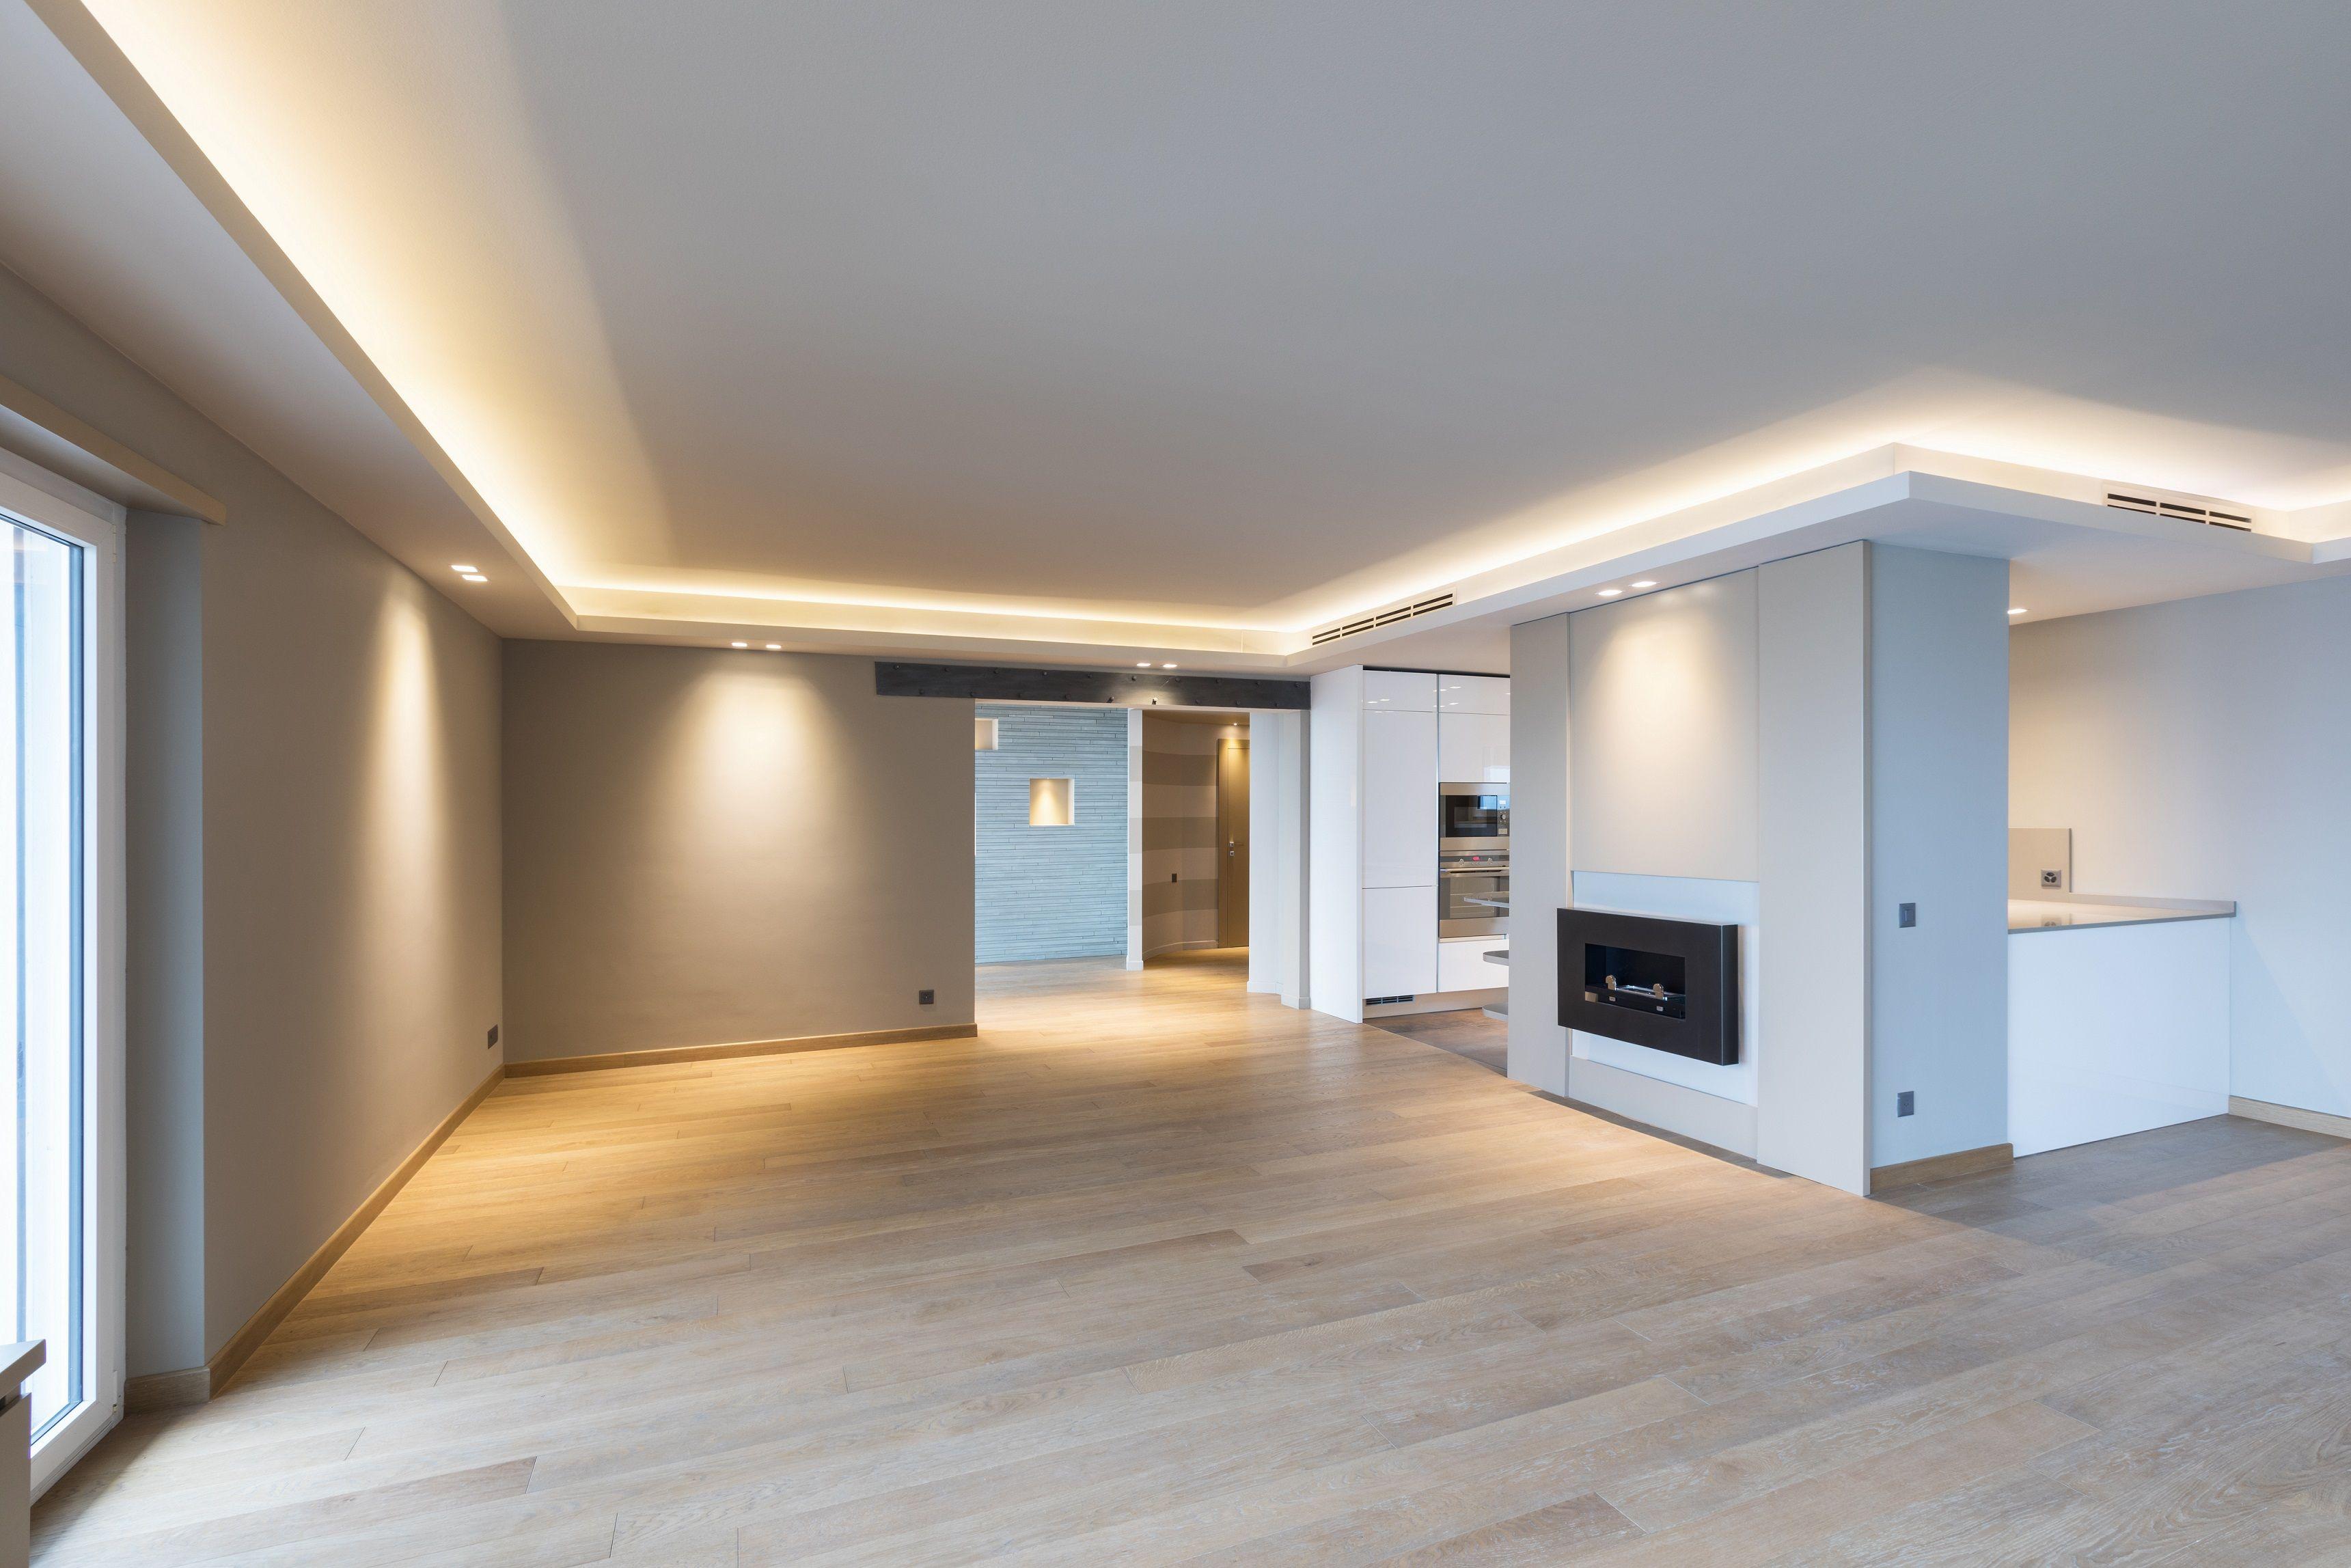 Apartment Lights Ceiling Design Living Room Ceiling Li